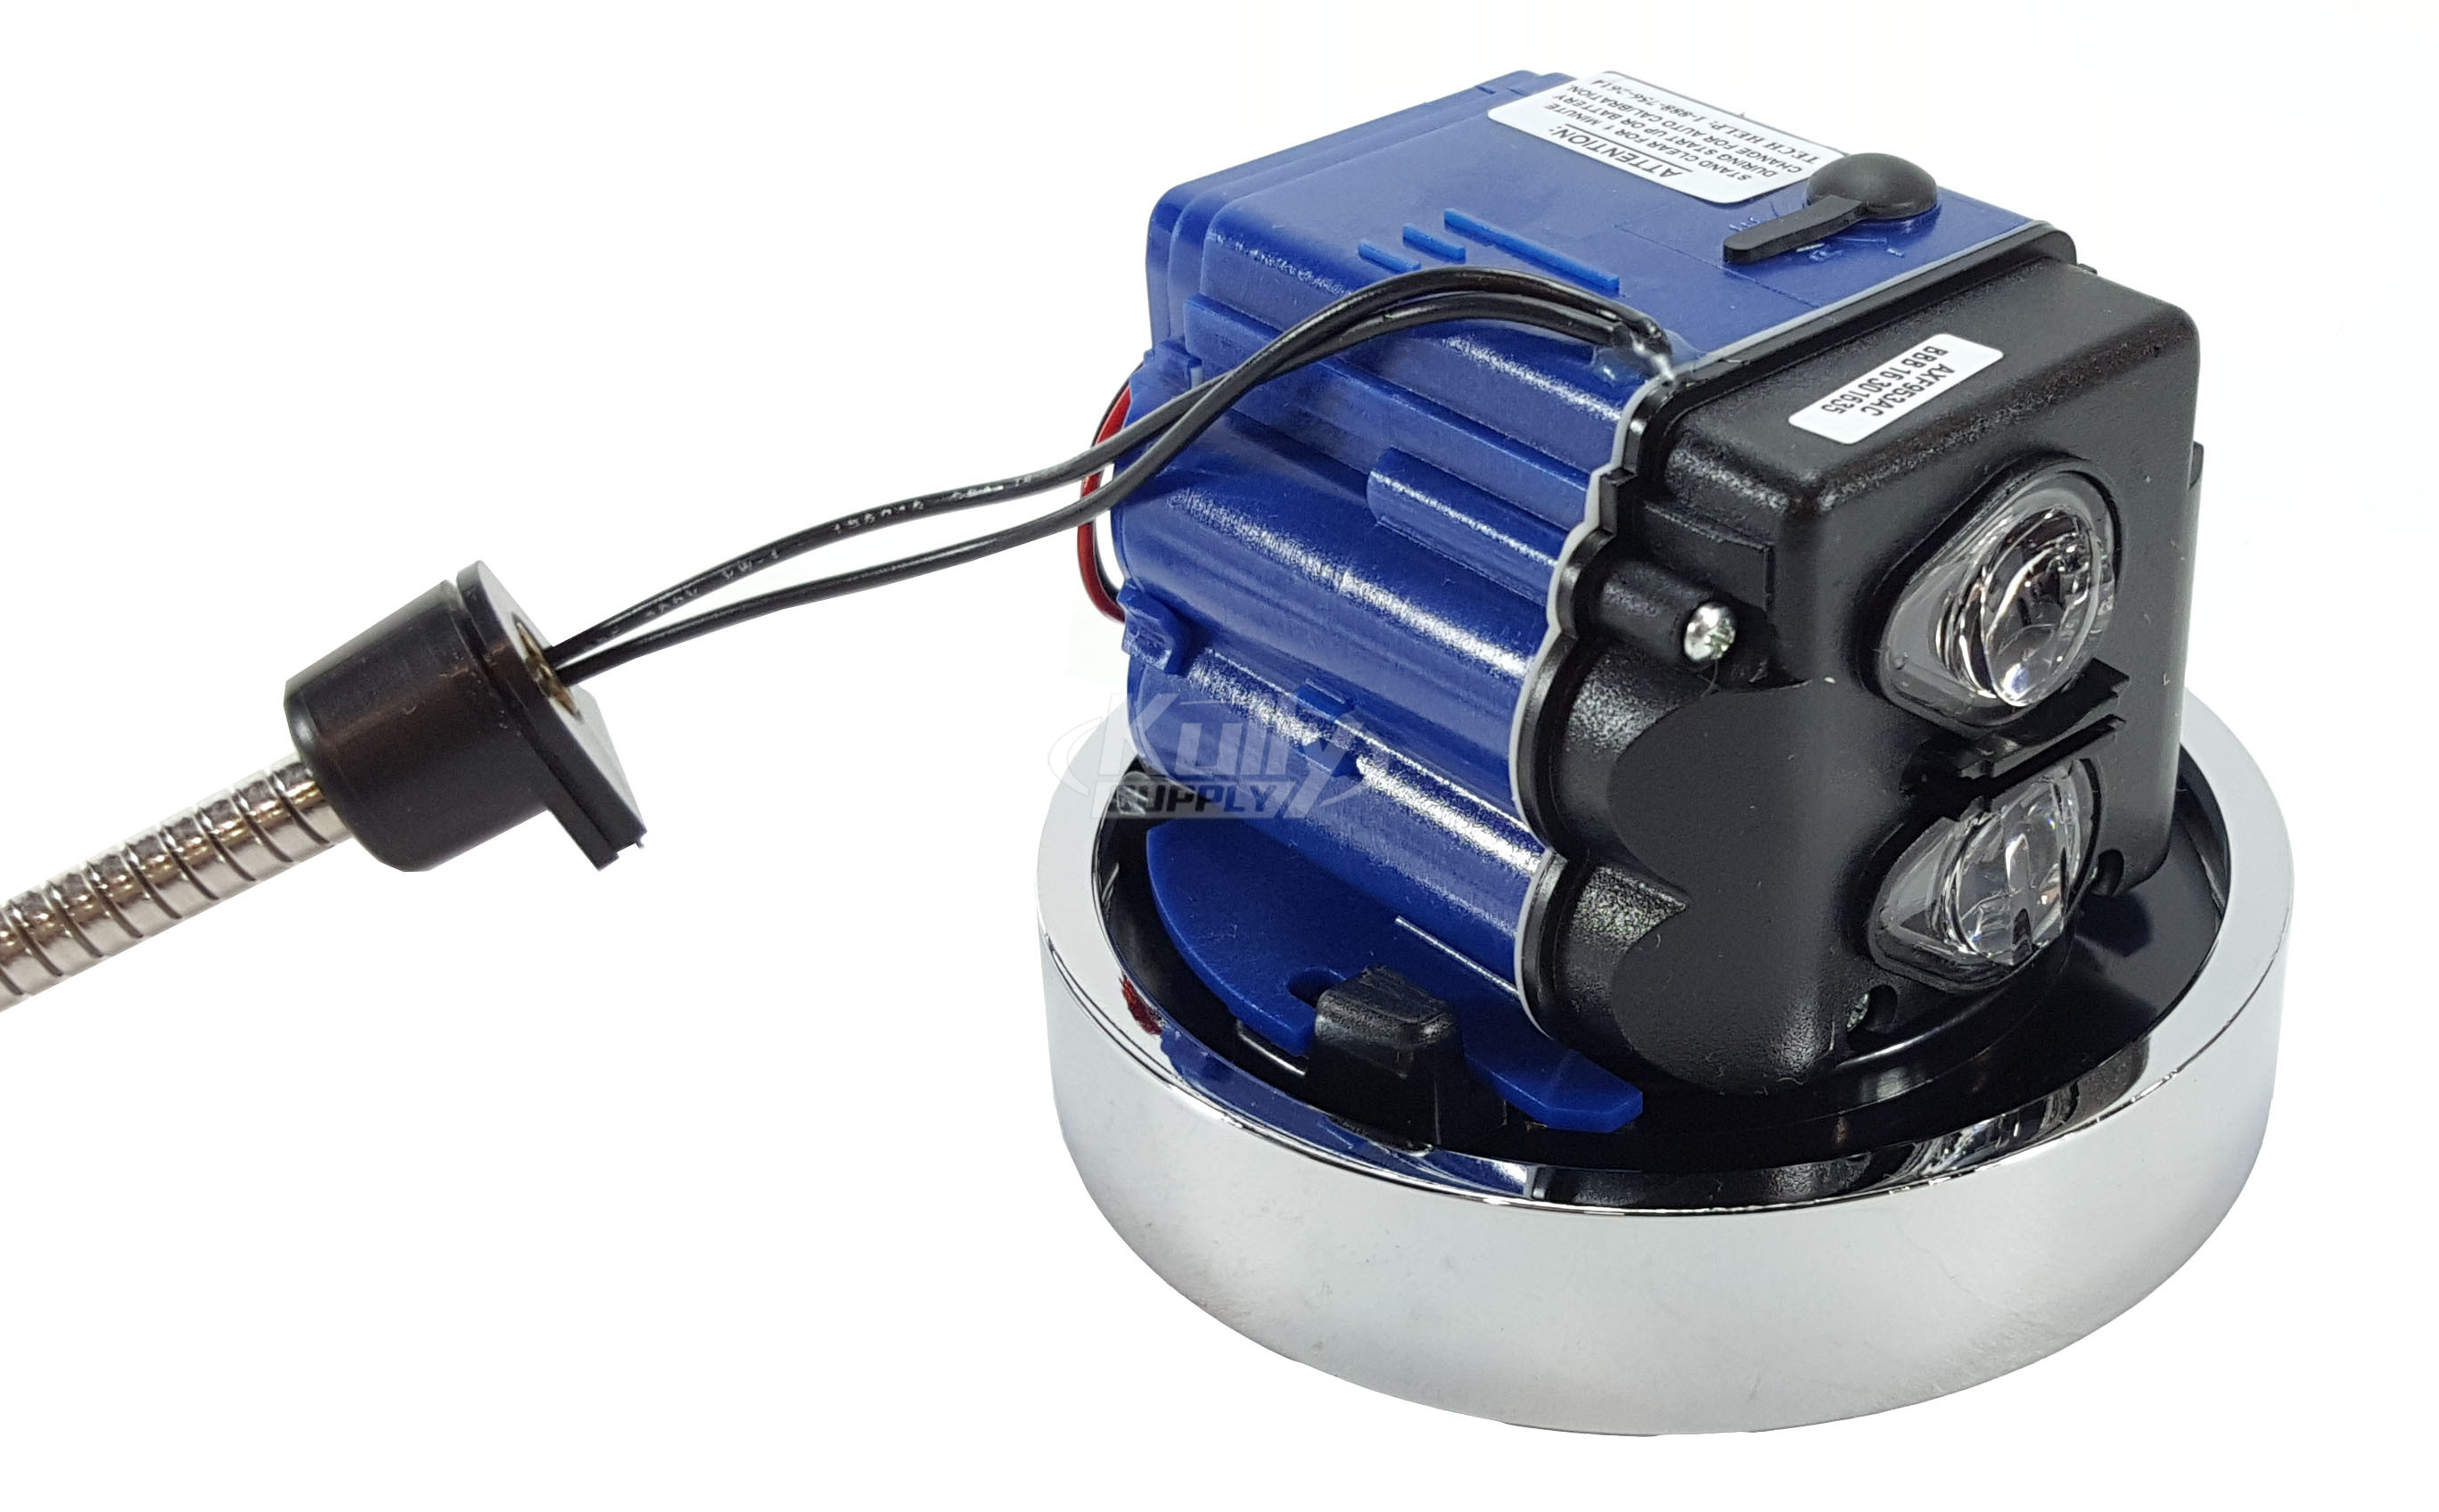 Sloan Ebv 332 A Ecos Hardwire Head Assembly Kullysupply Com